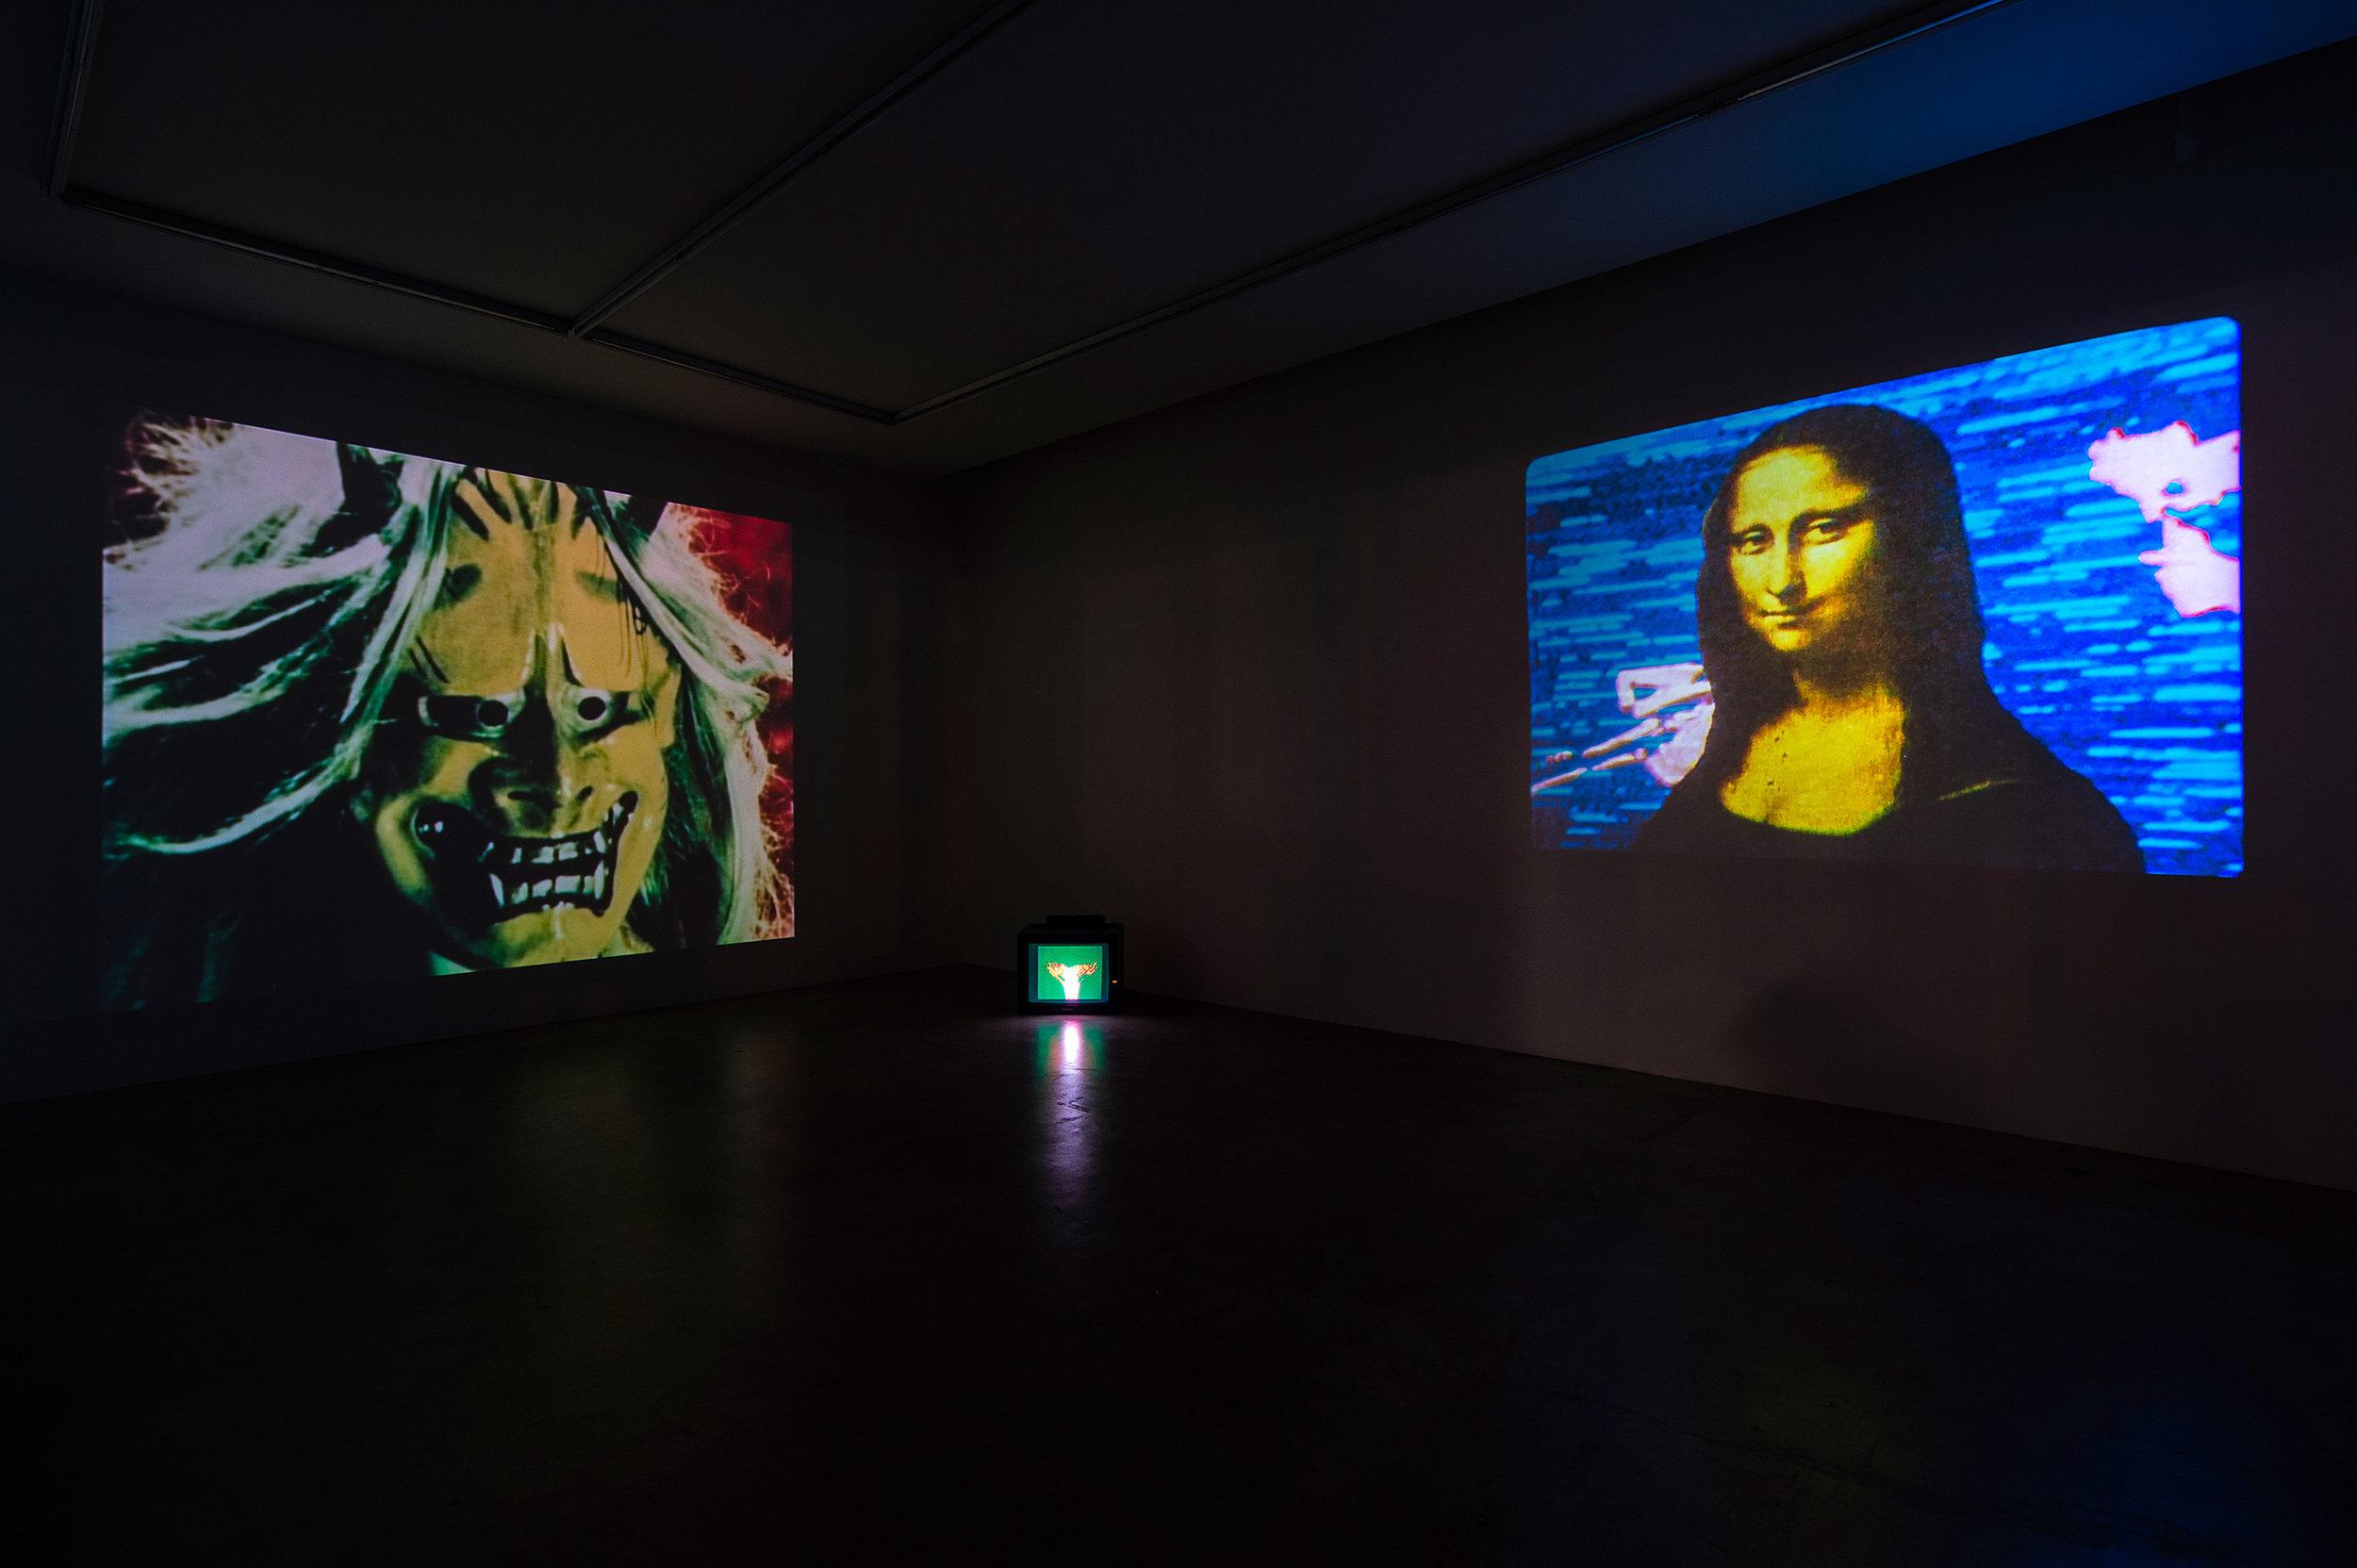 Left: Atman, 1975, 16mm, 11min Center: Expansion, 1972, 16mm, 14min Right: Mona Lisa, 1973, 16mm, 3min